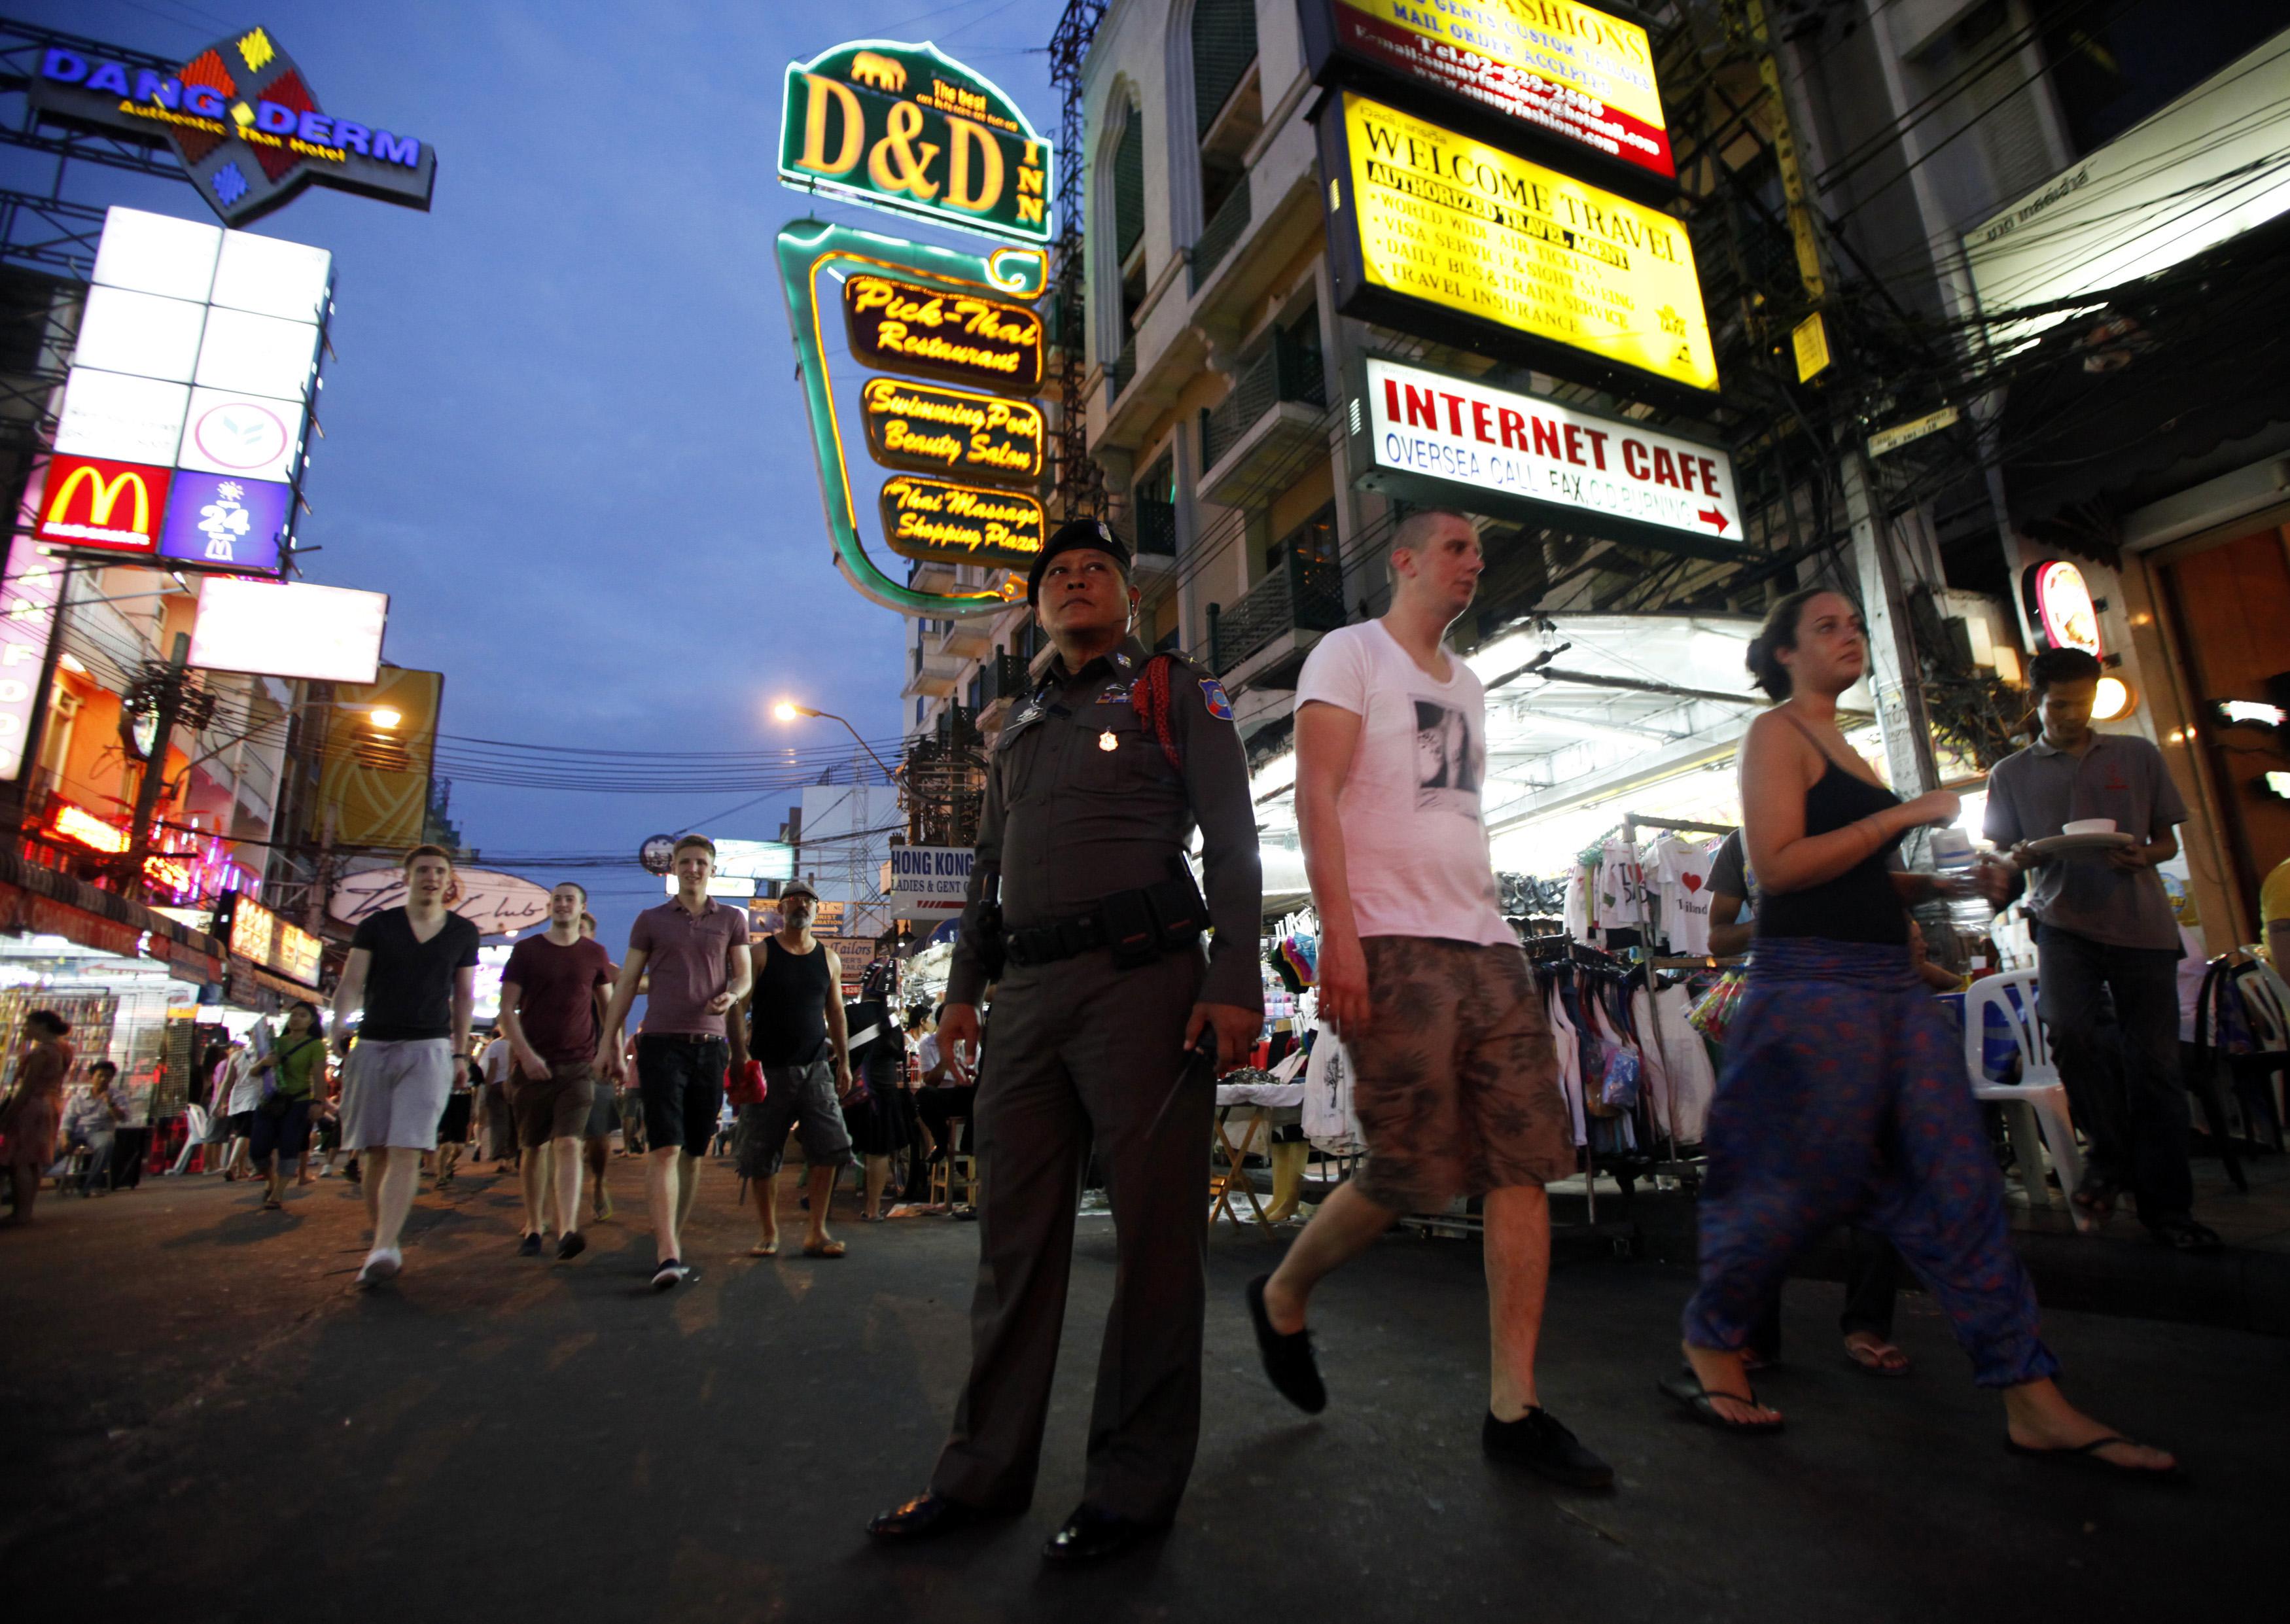 A policeman stands guard as tourists walk along Khaosan Road in Bangkok on Jan. 19, 2012